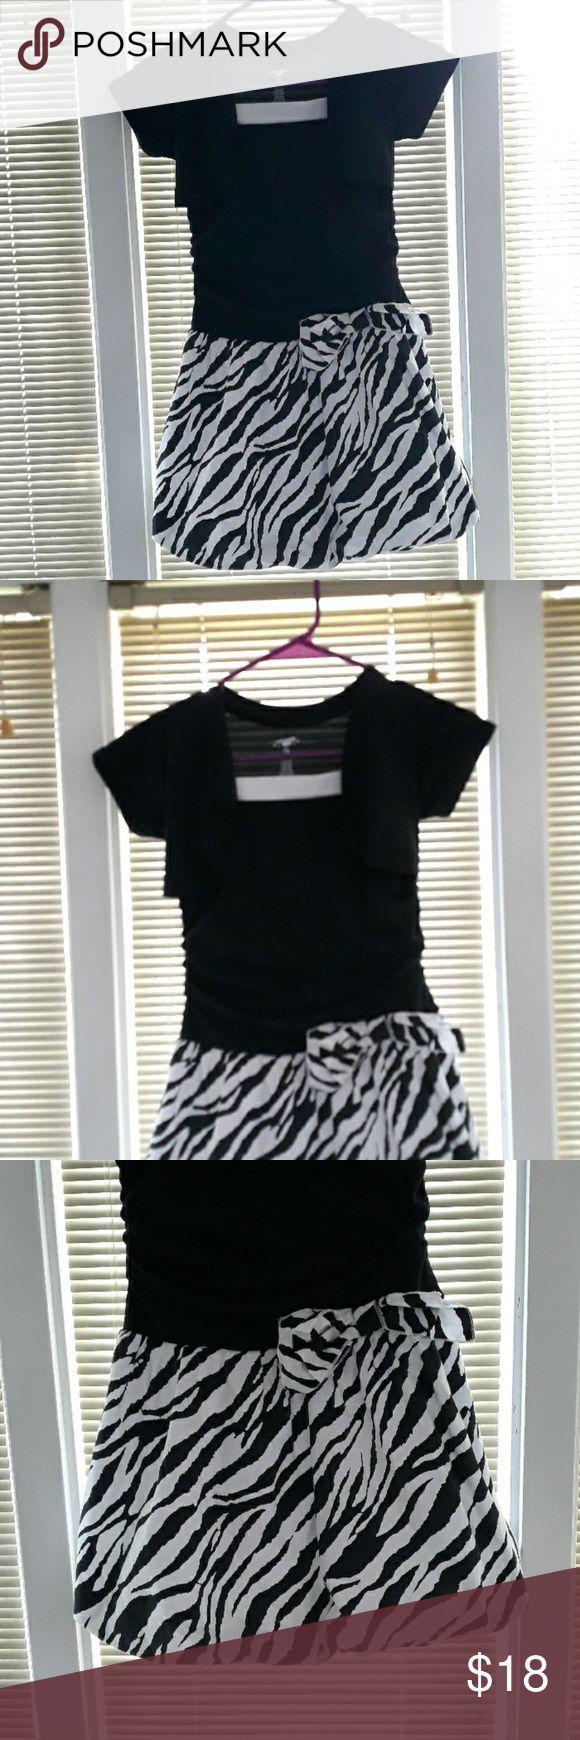 Extrem Me schwarz-weißes Kleid mit Zebrastreifen Extrem Me ...